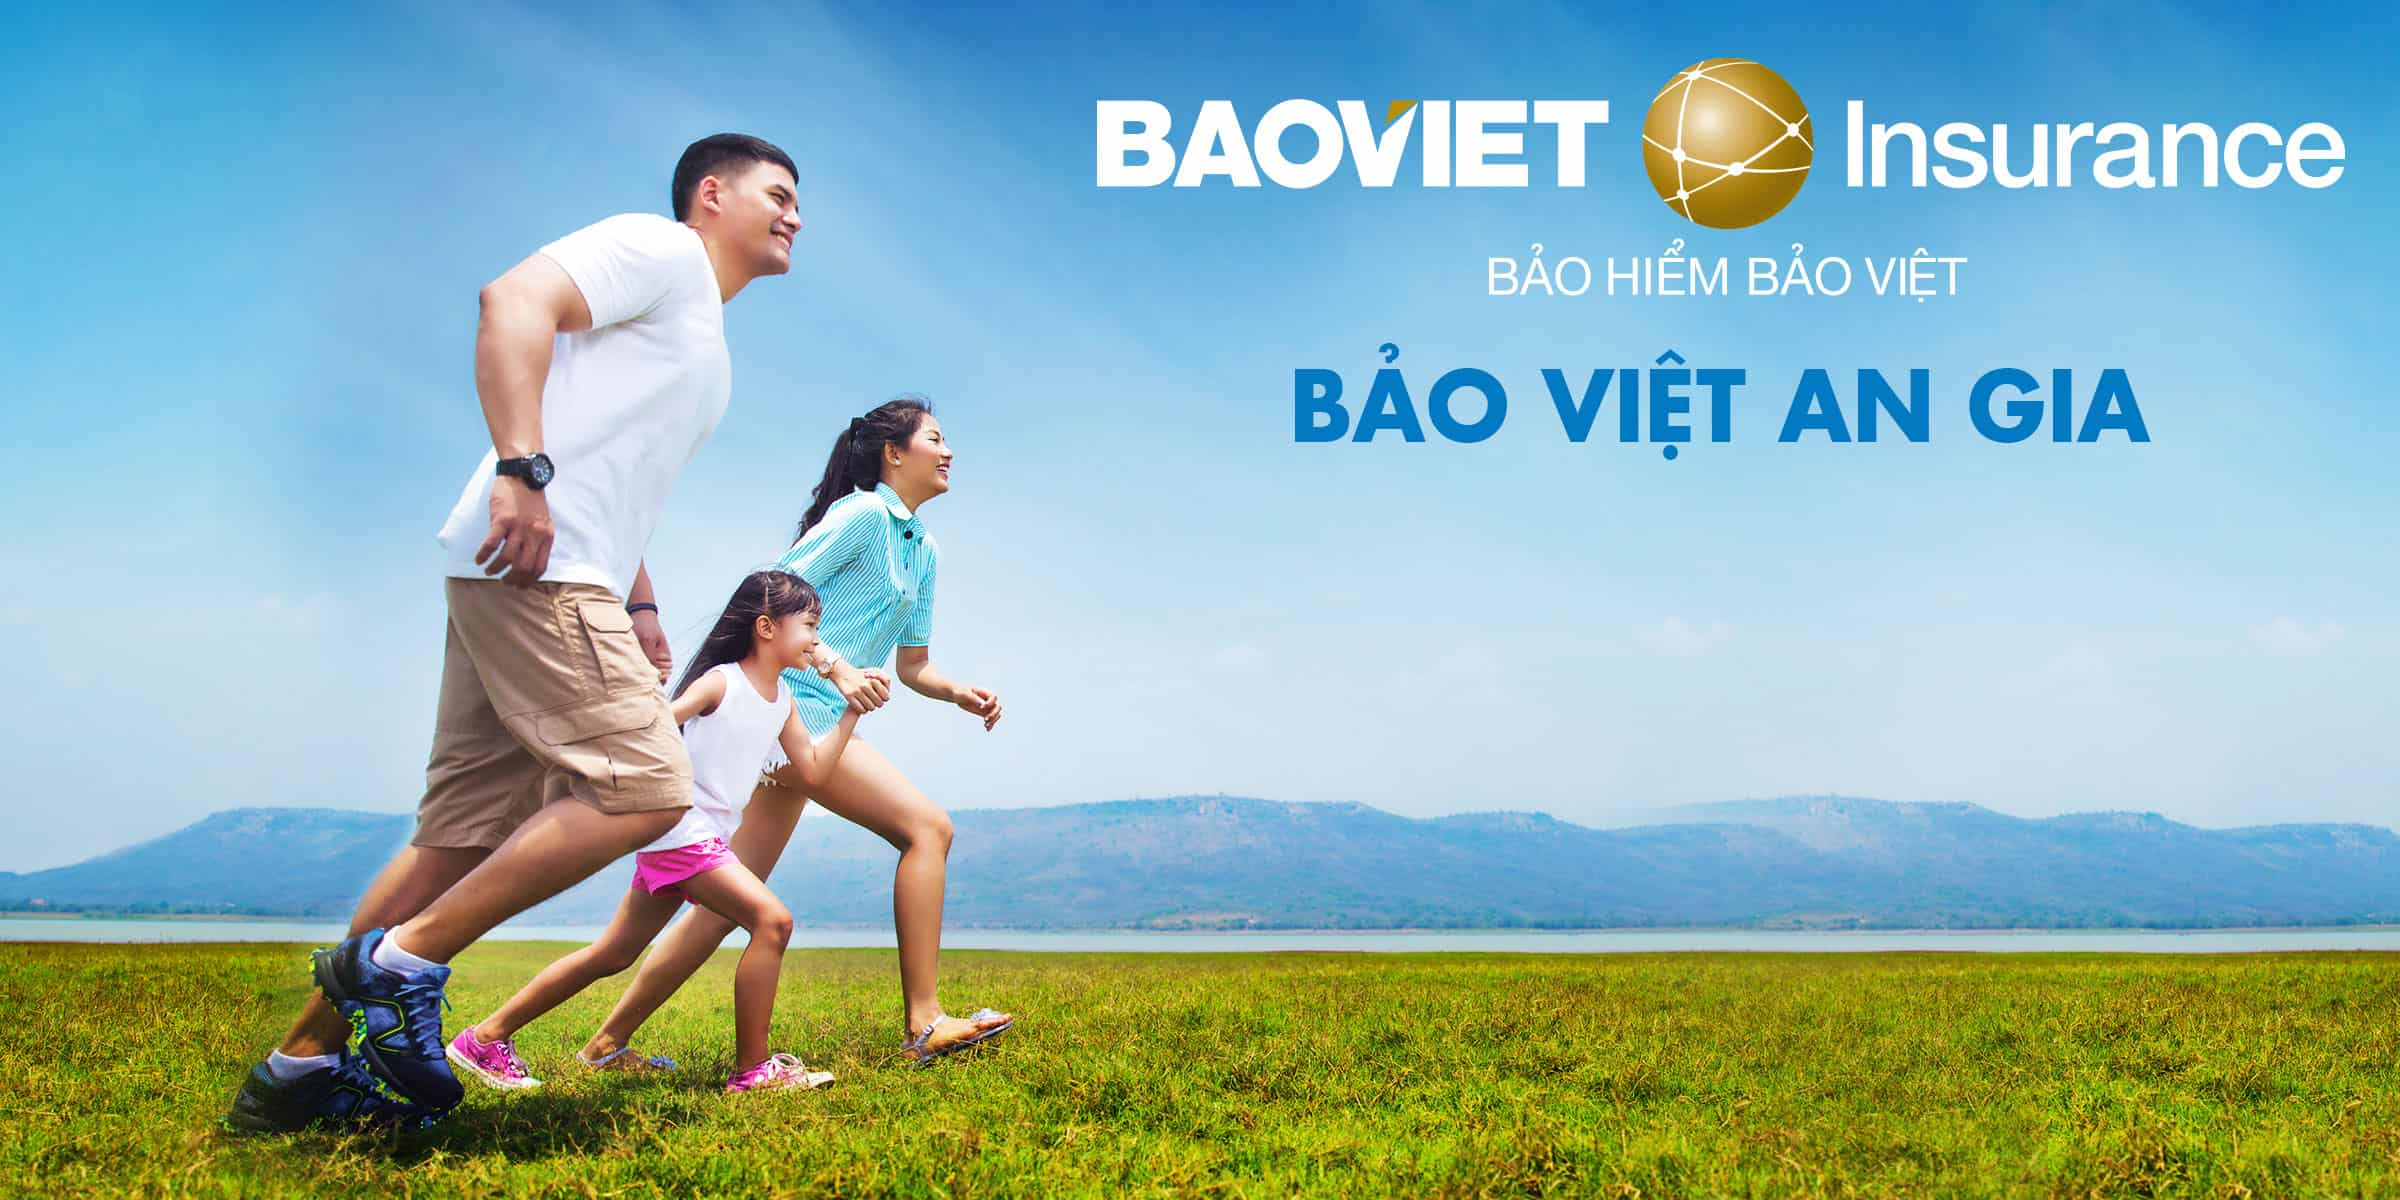 Bảo Việt An Gia